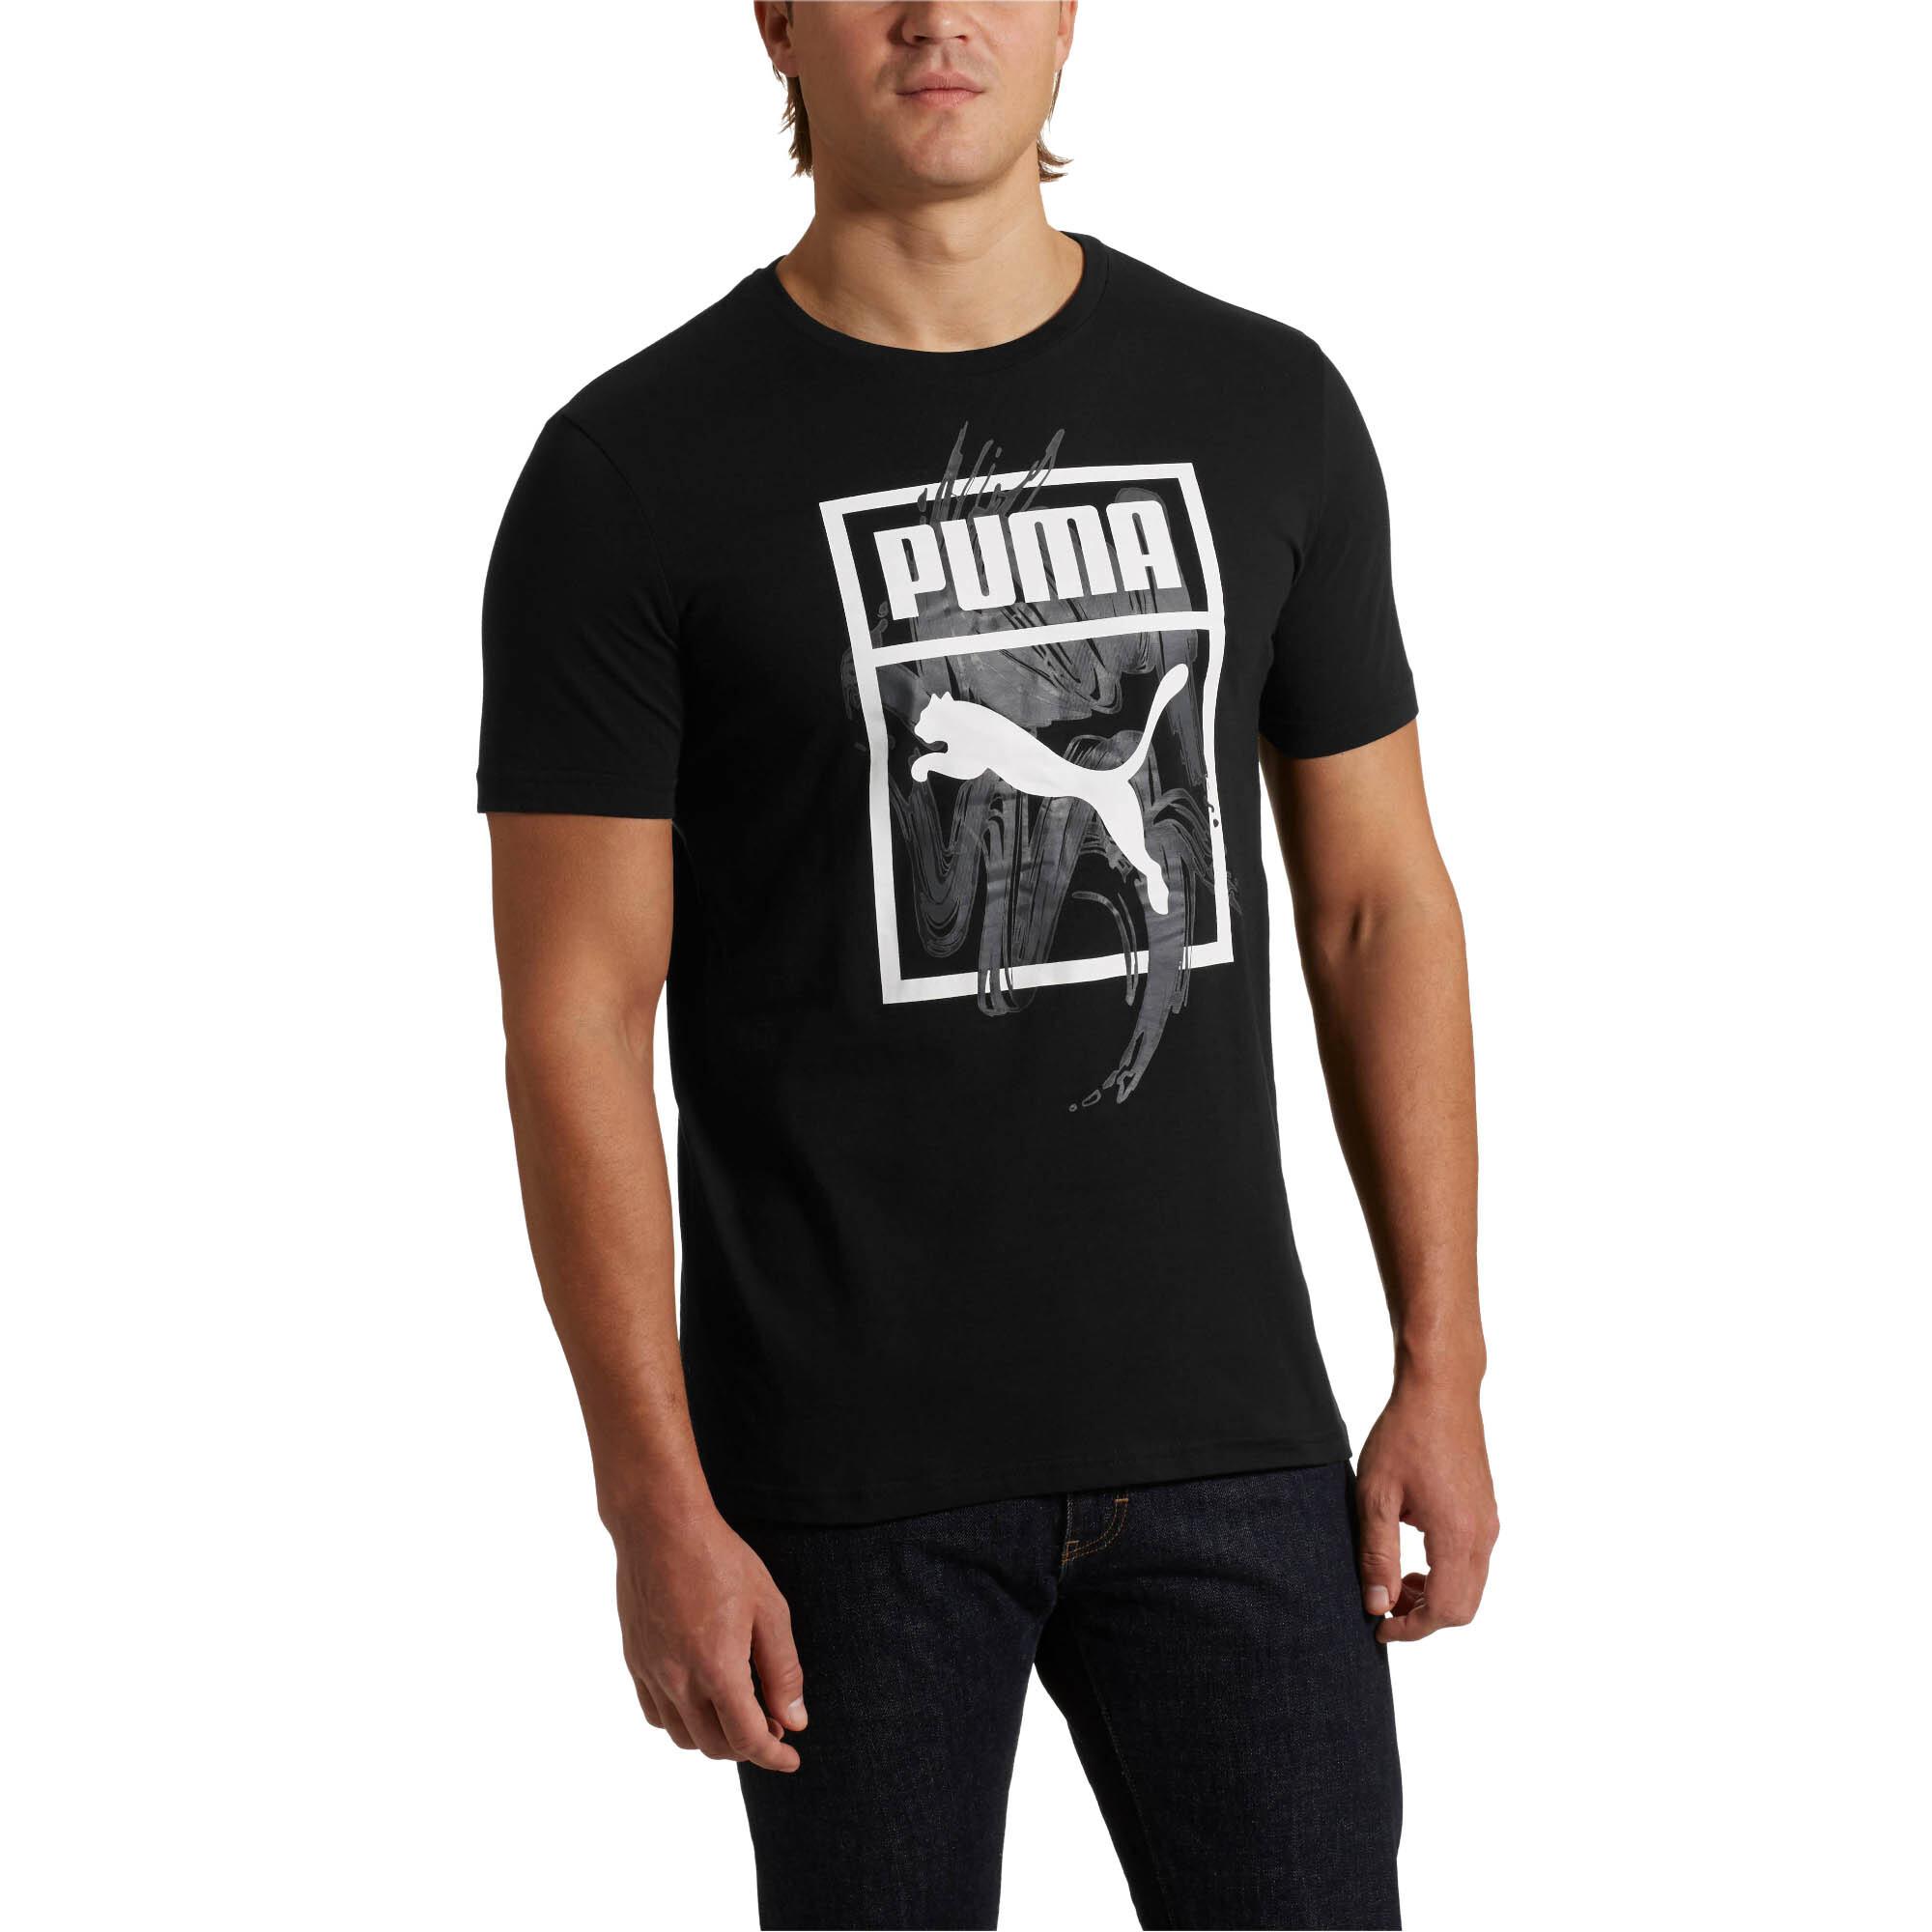 PUMA-Graphic-Logo-Brush-Tee-Men-Tee-Sport-Classics thumbnail 10